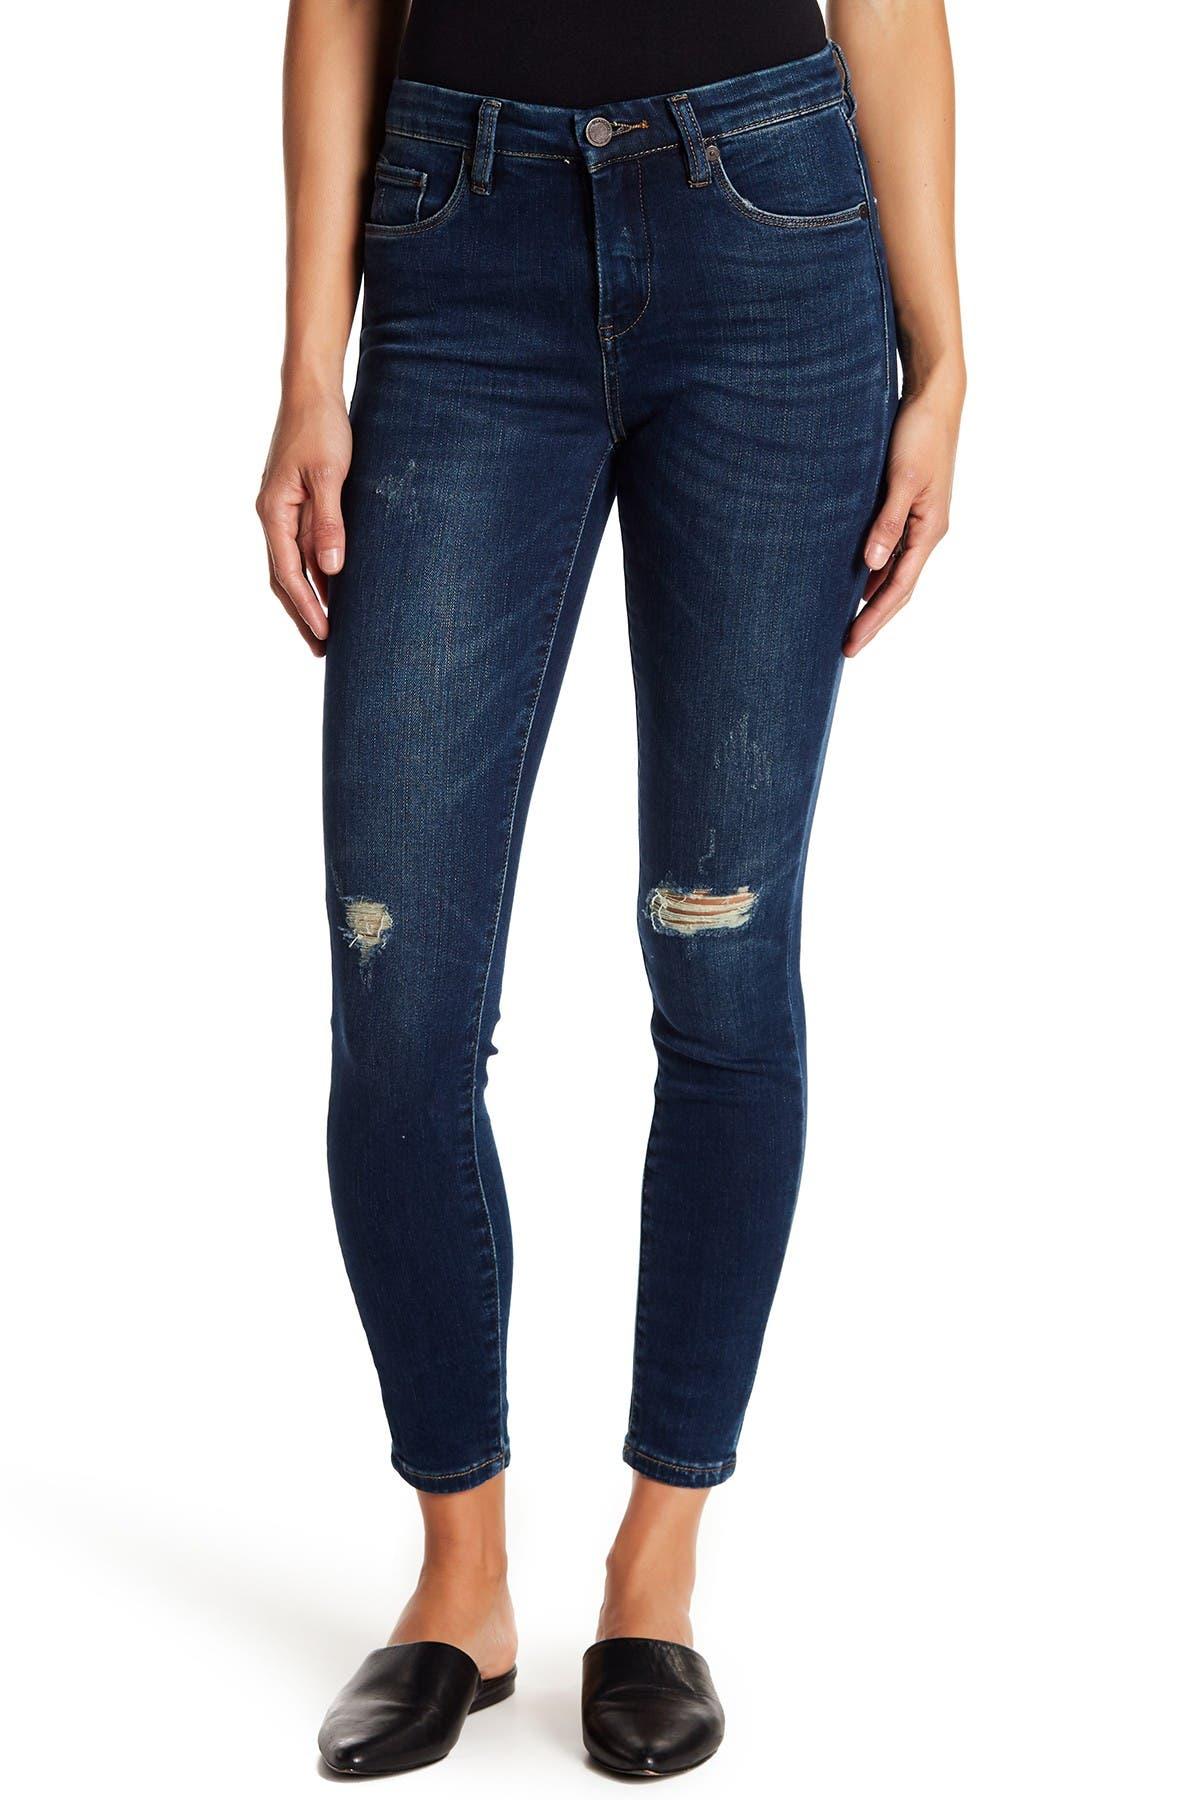 Image of BLANKNYC Denim Ripped Mid Rise Skinny Jeans